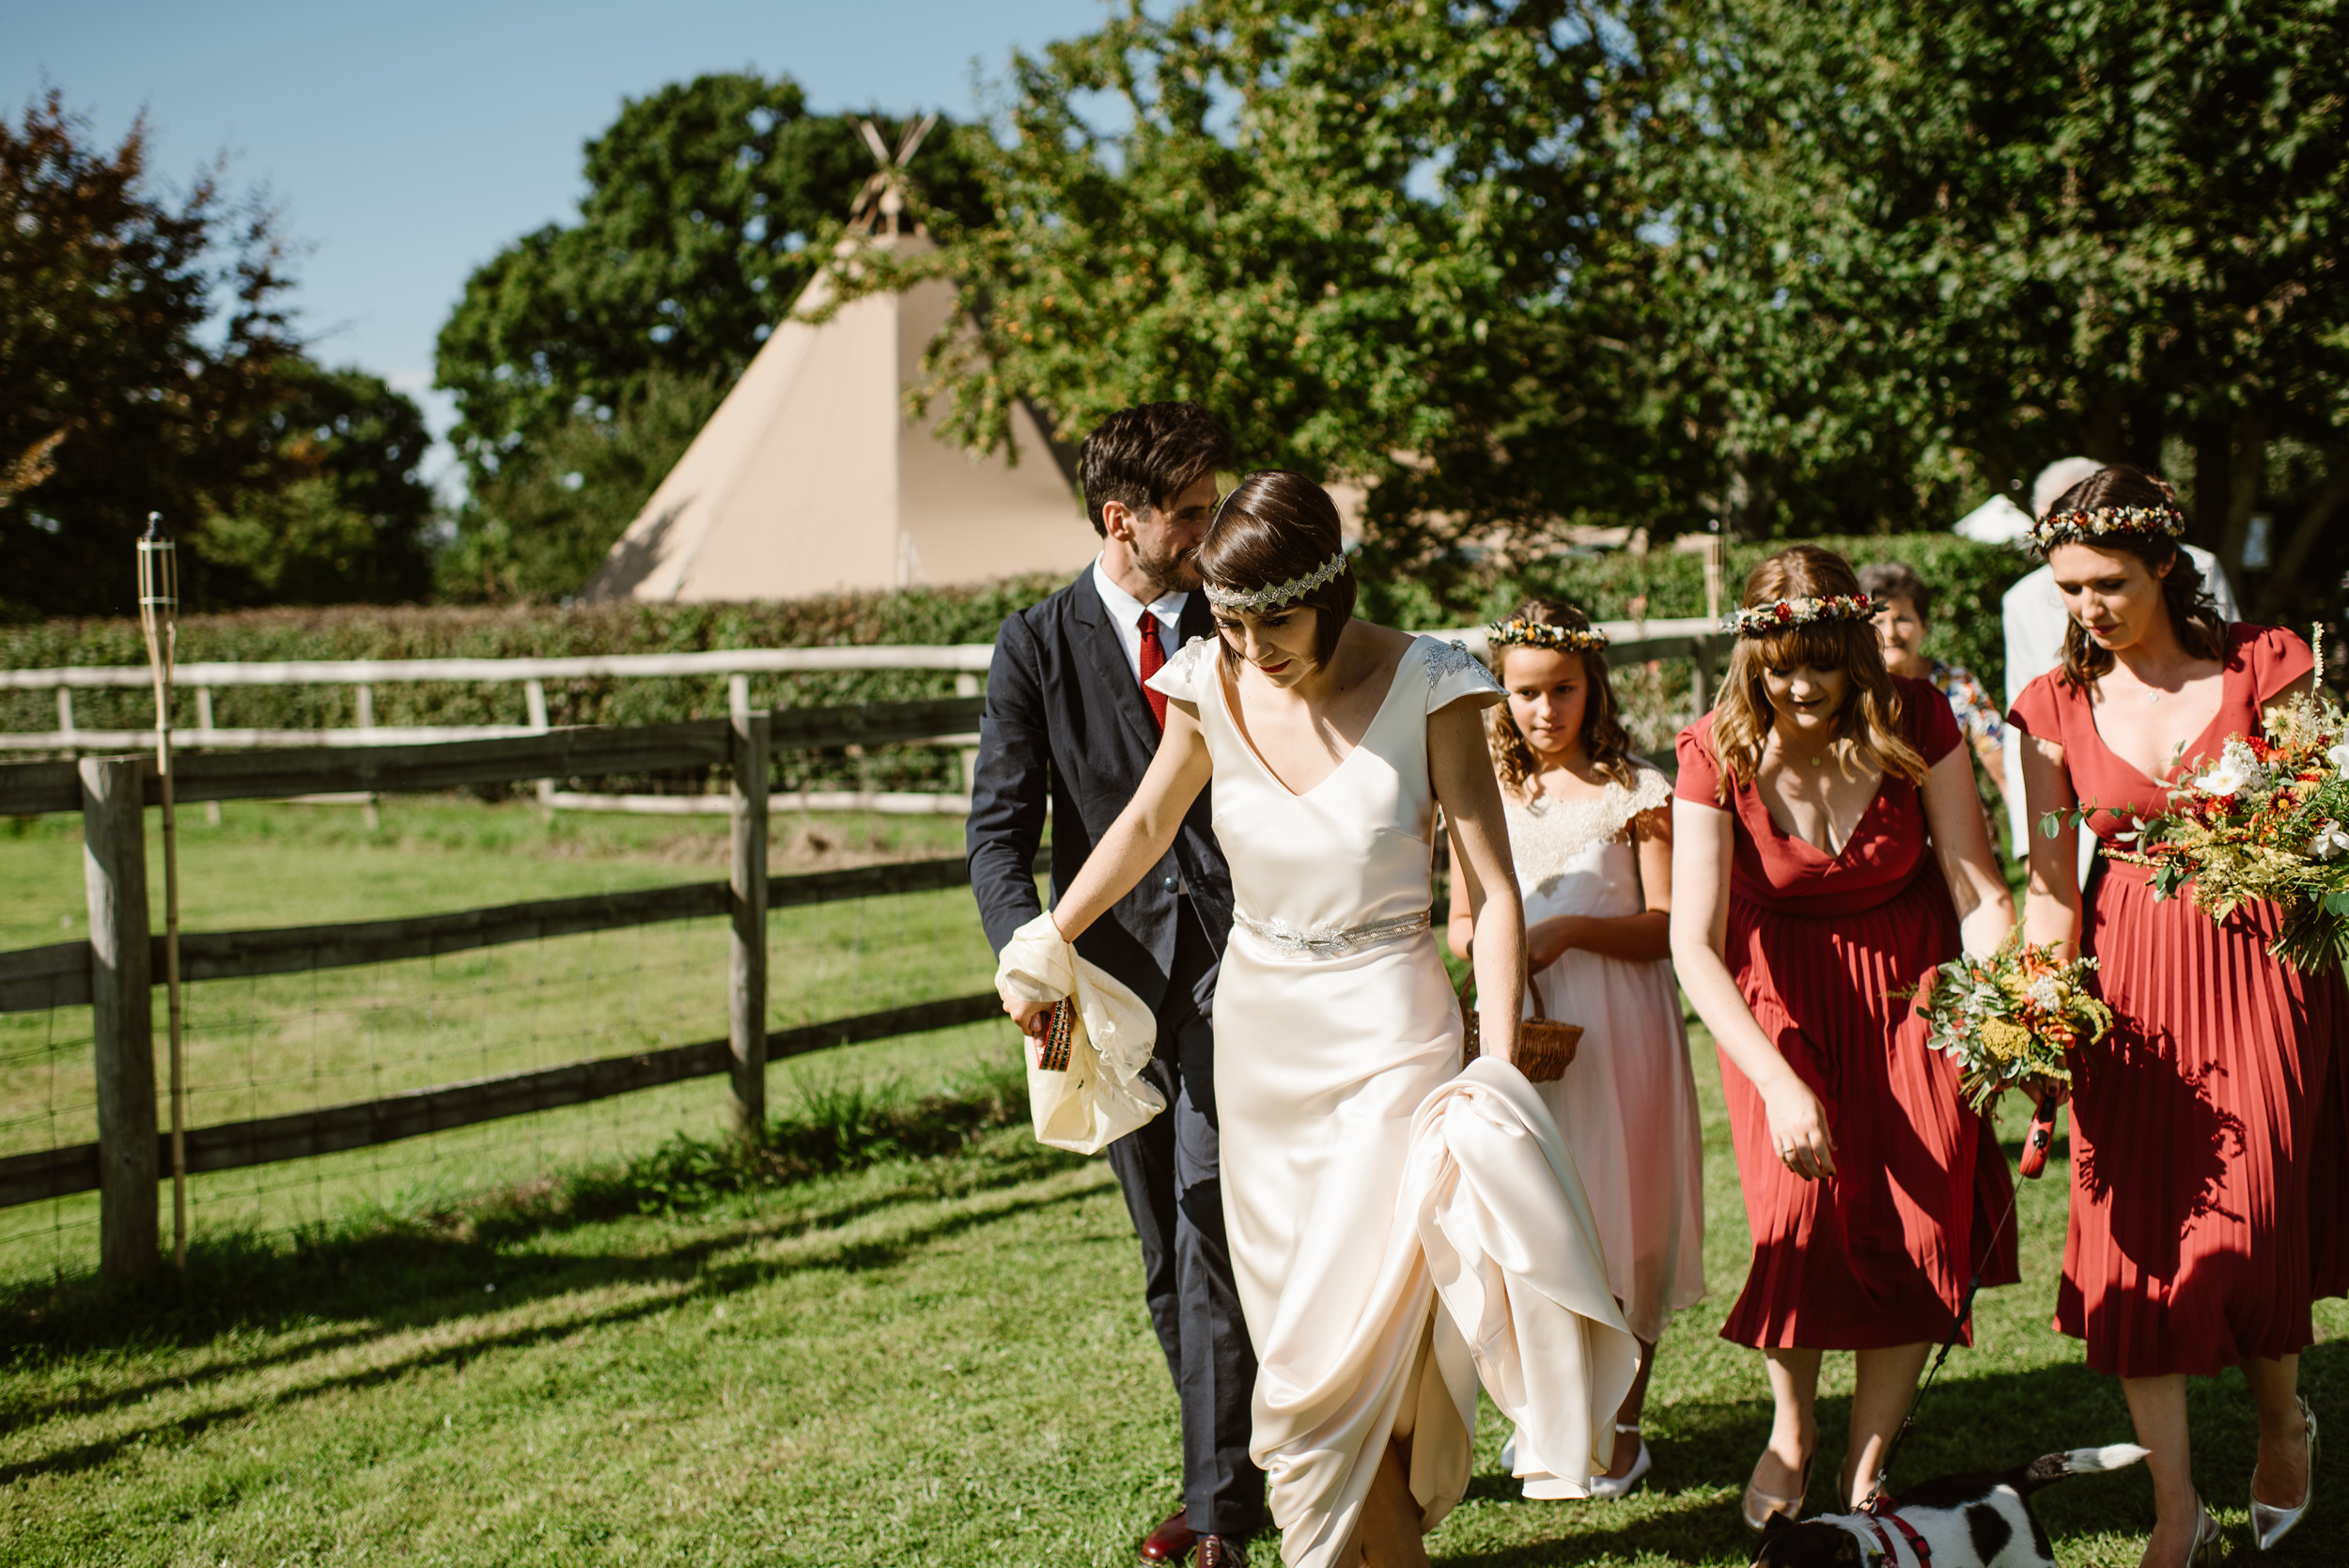 Ro-Kate-Beaumont-bias-cut-silk-wedding-gown-back-garden-wedding-by-Ellie-Gillard-9.jpg